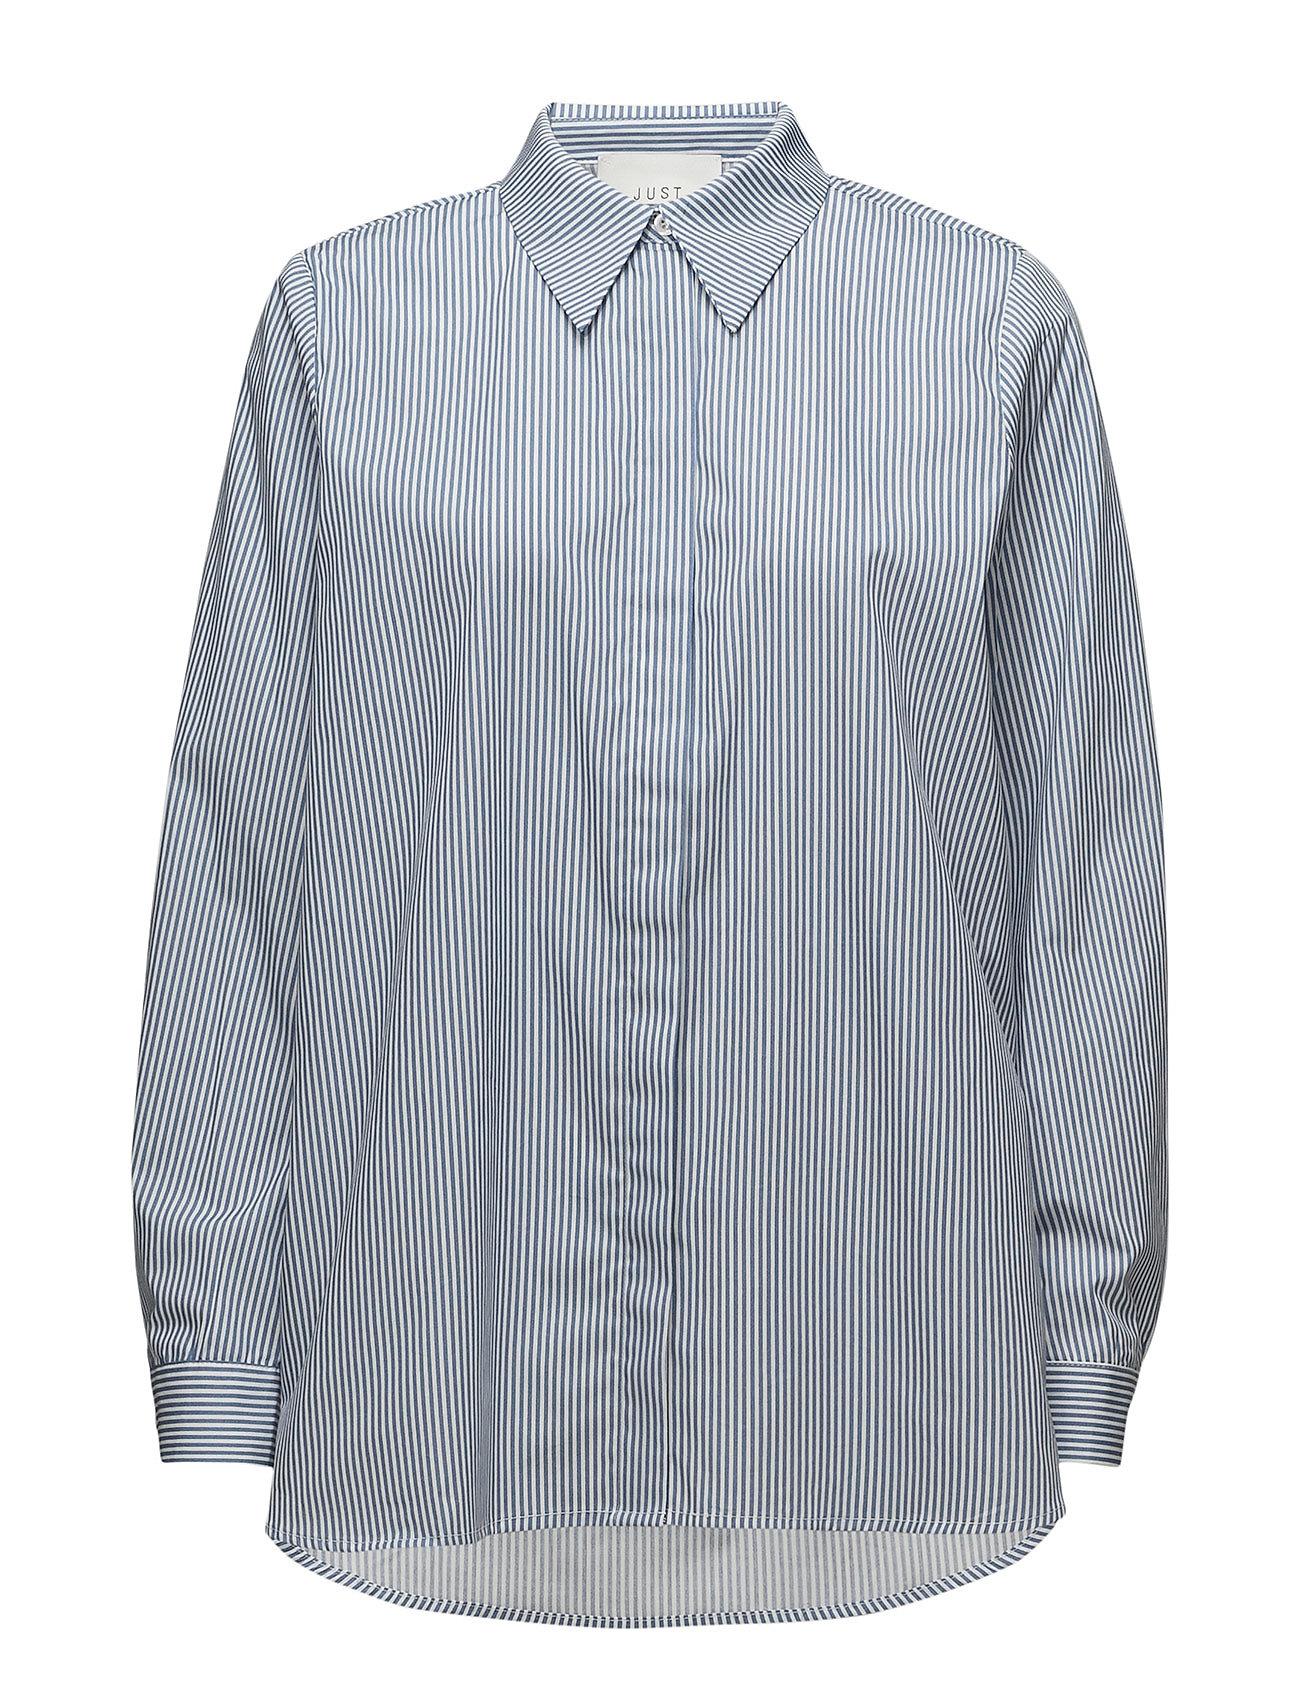 Image of Timeo Shirt Langærmet Skjorte Blå Just Female (3052621077)